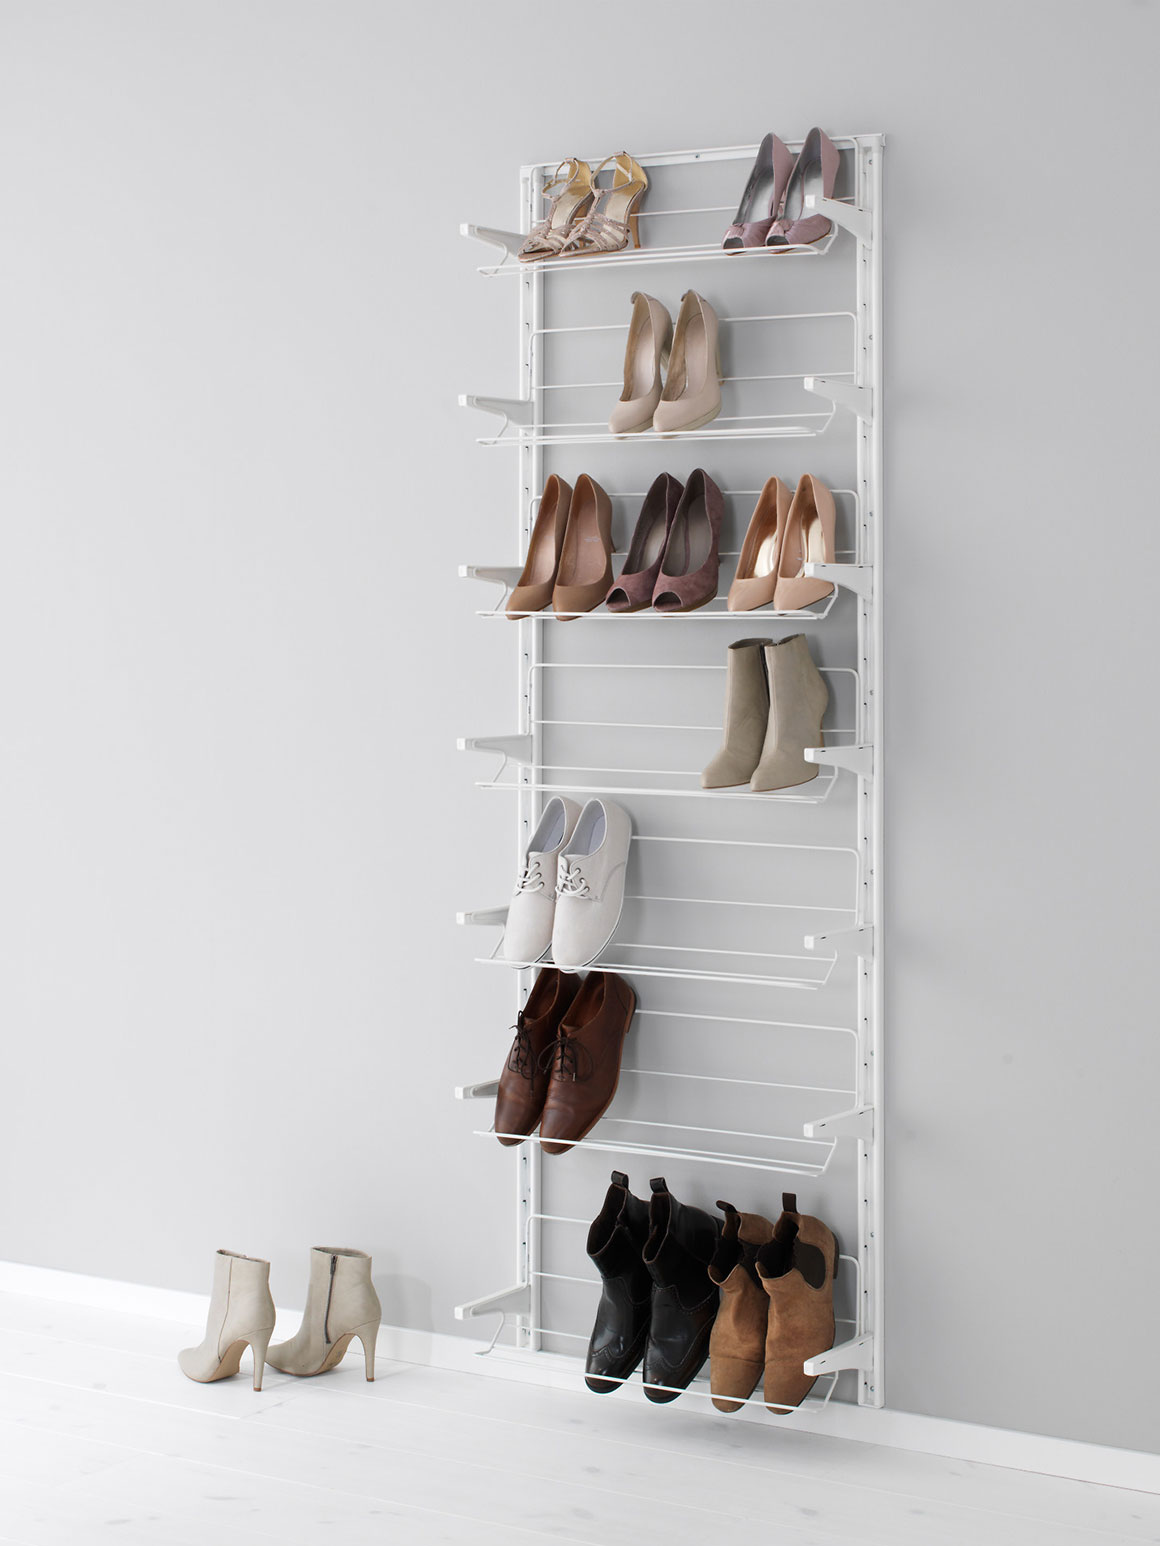 ikea-algot-schoenenrek